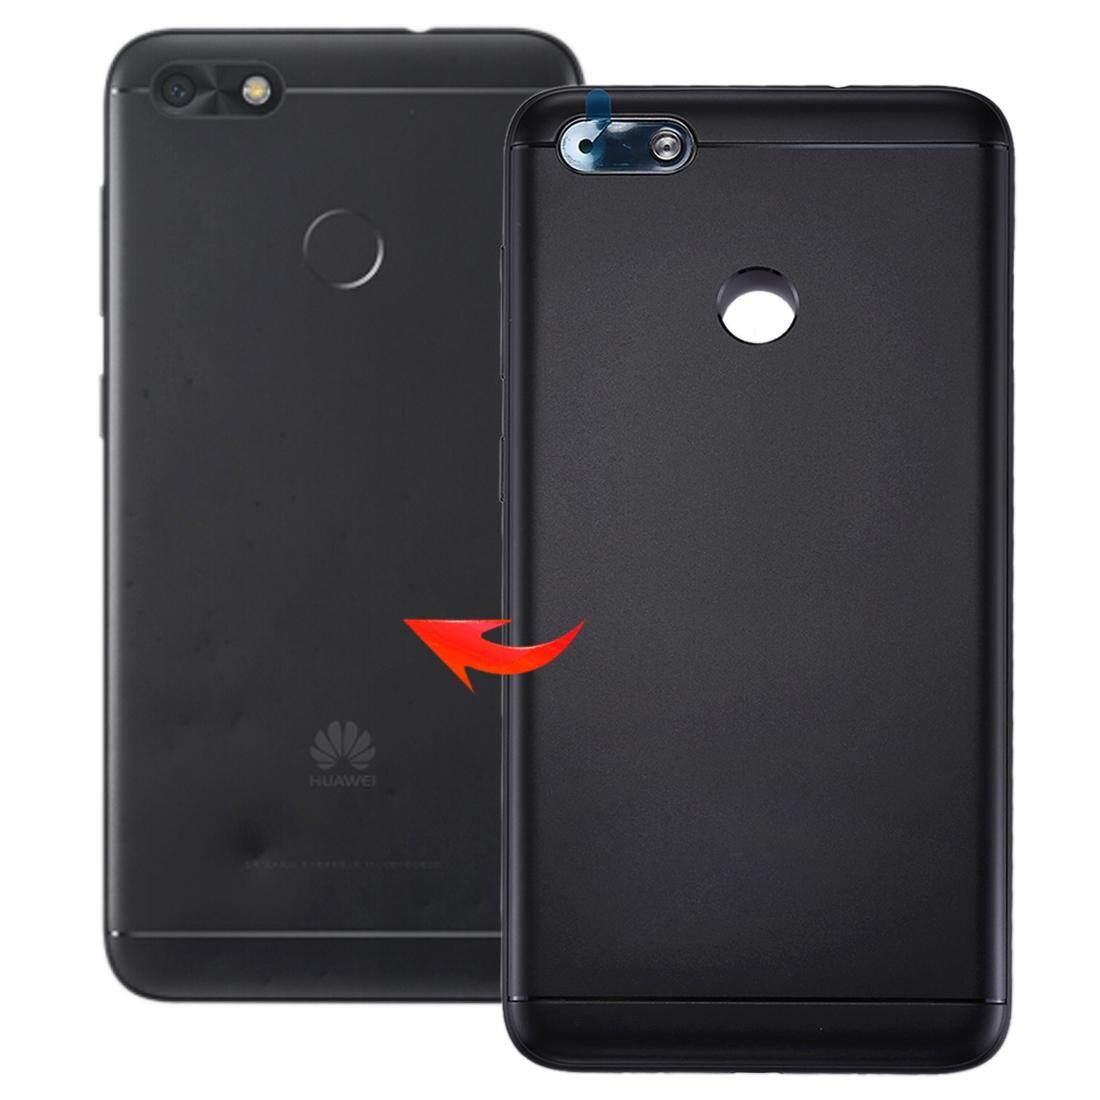 for Huawei Enjoy 7 / P9 Lite Mini / Y6 Pro (2017) Back Cover(Black)